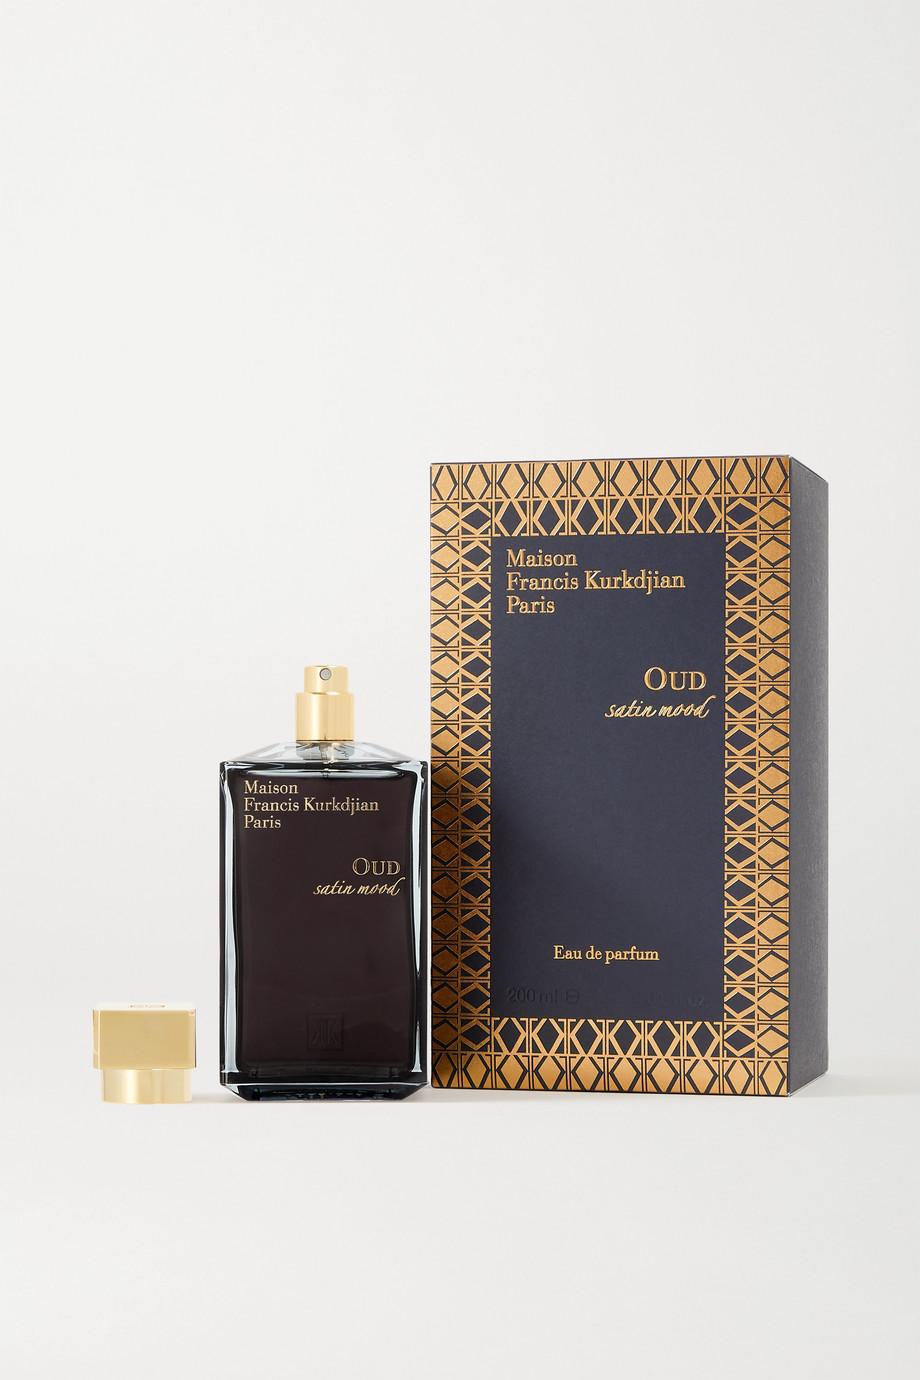 Maison Francis Kurkdjian Eau de Parfum - Oud Satin Mood, 200ml